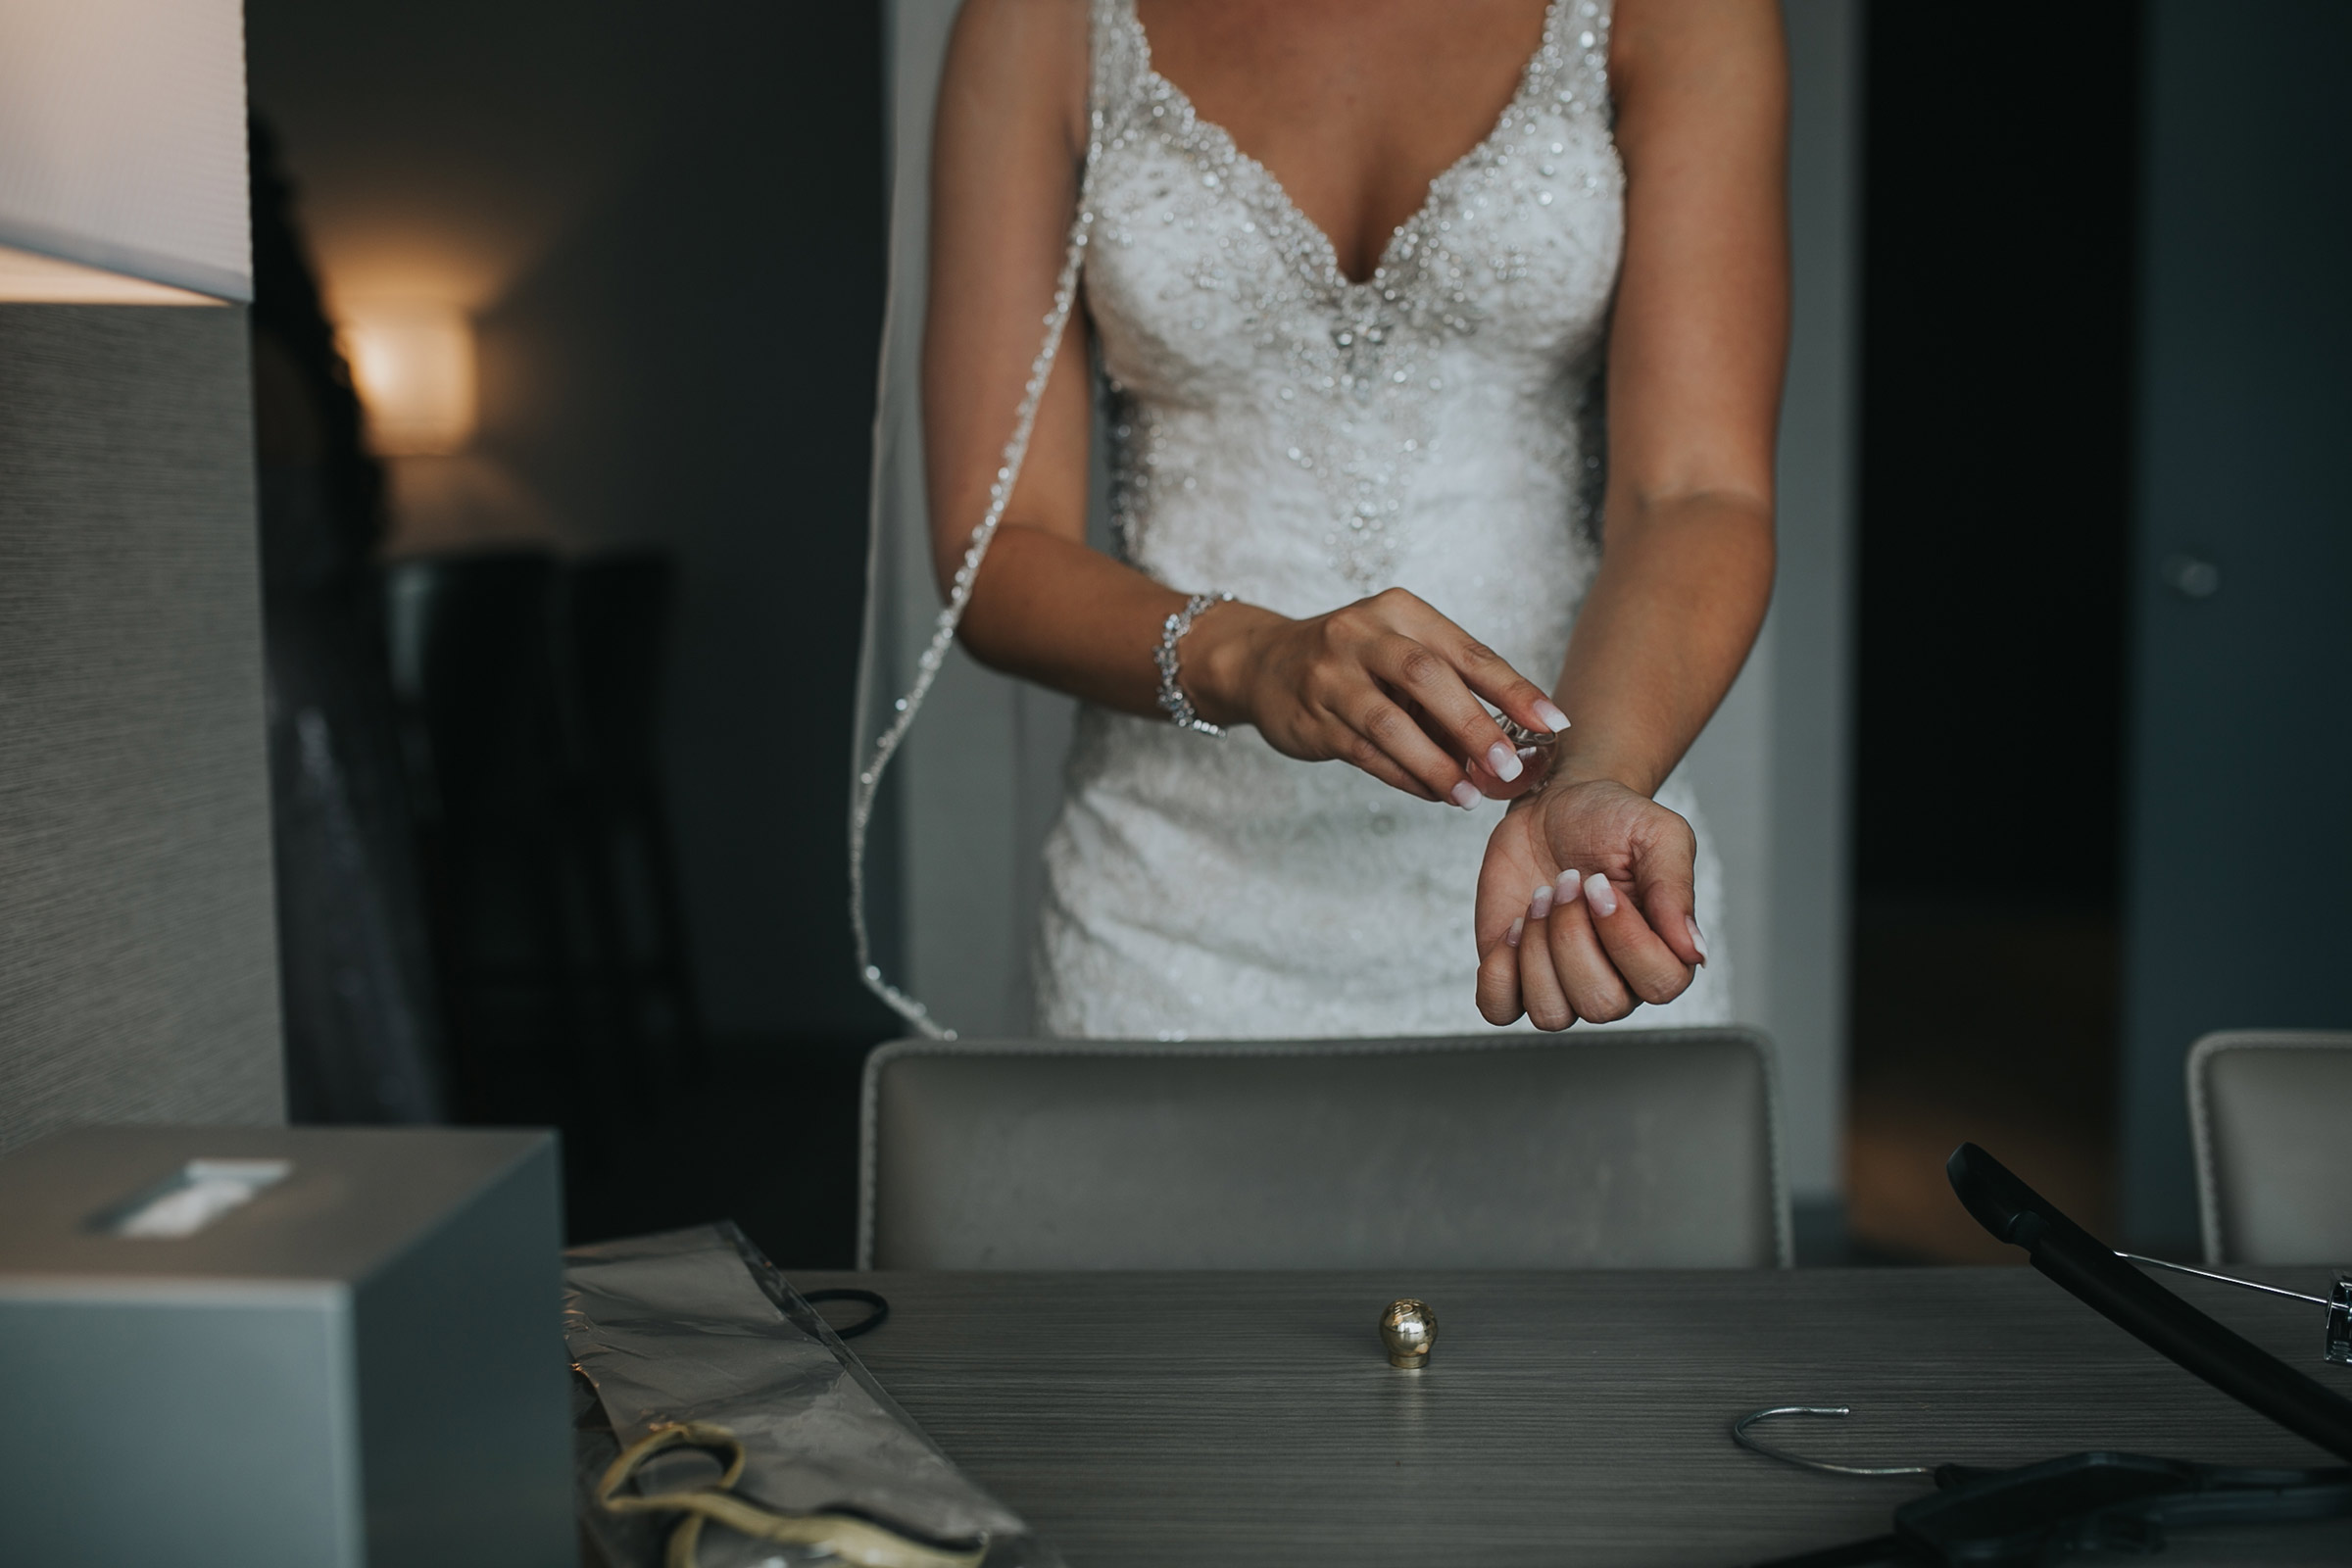 bride-putting-perfume-on-desmoines-iowa-ac-hotel-raelyn-ramey-photography.jpg